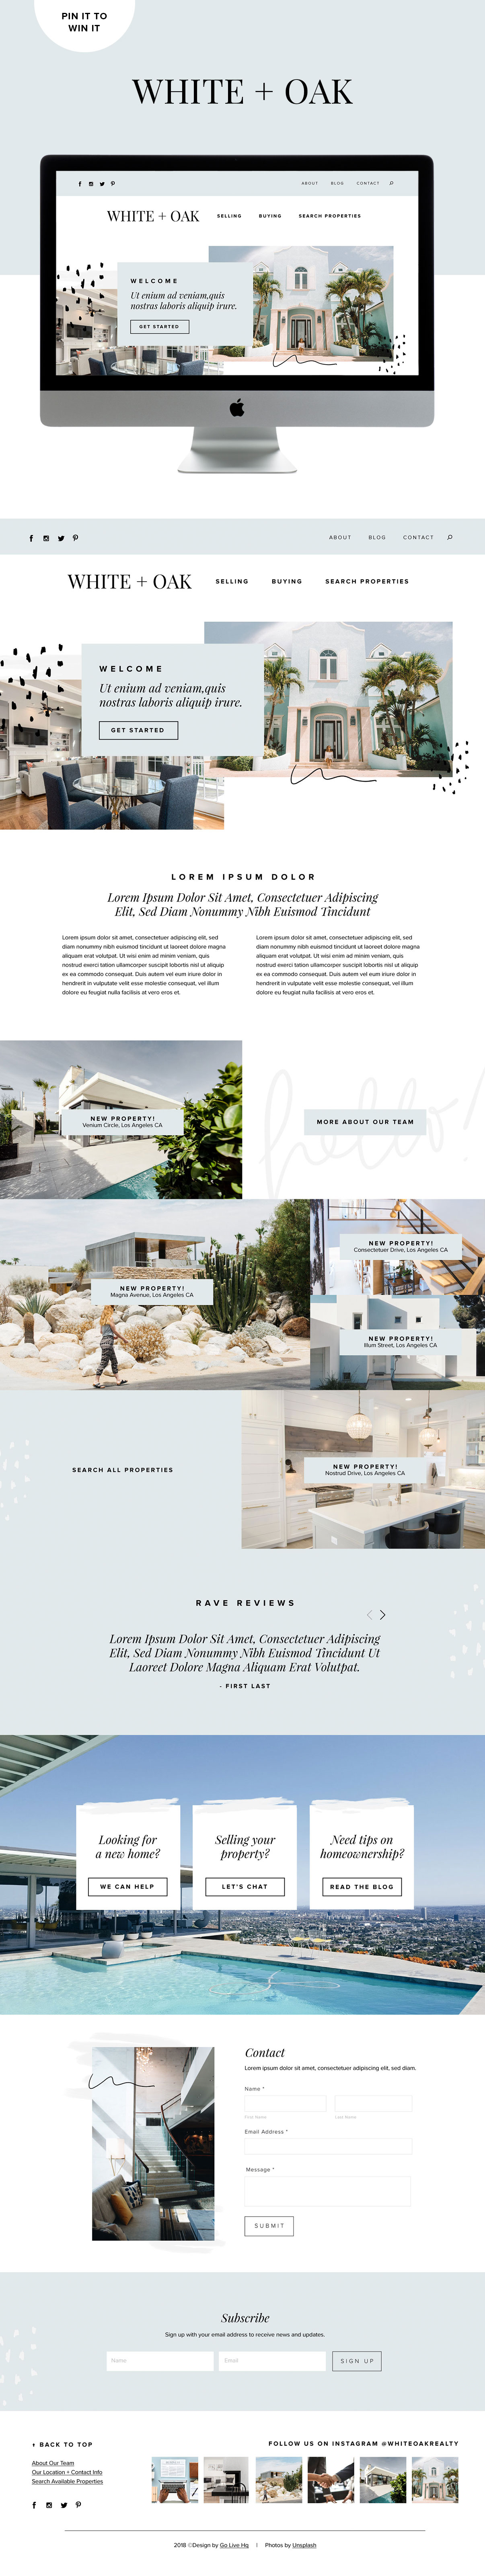 Modern and Fresh Website Design for Realtors & Home Designers | Go Live HQ